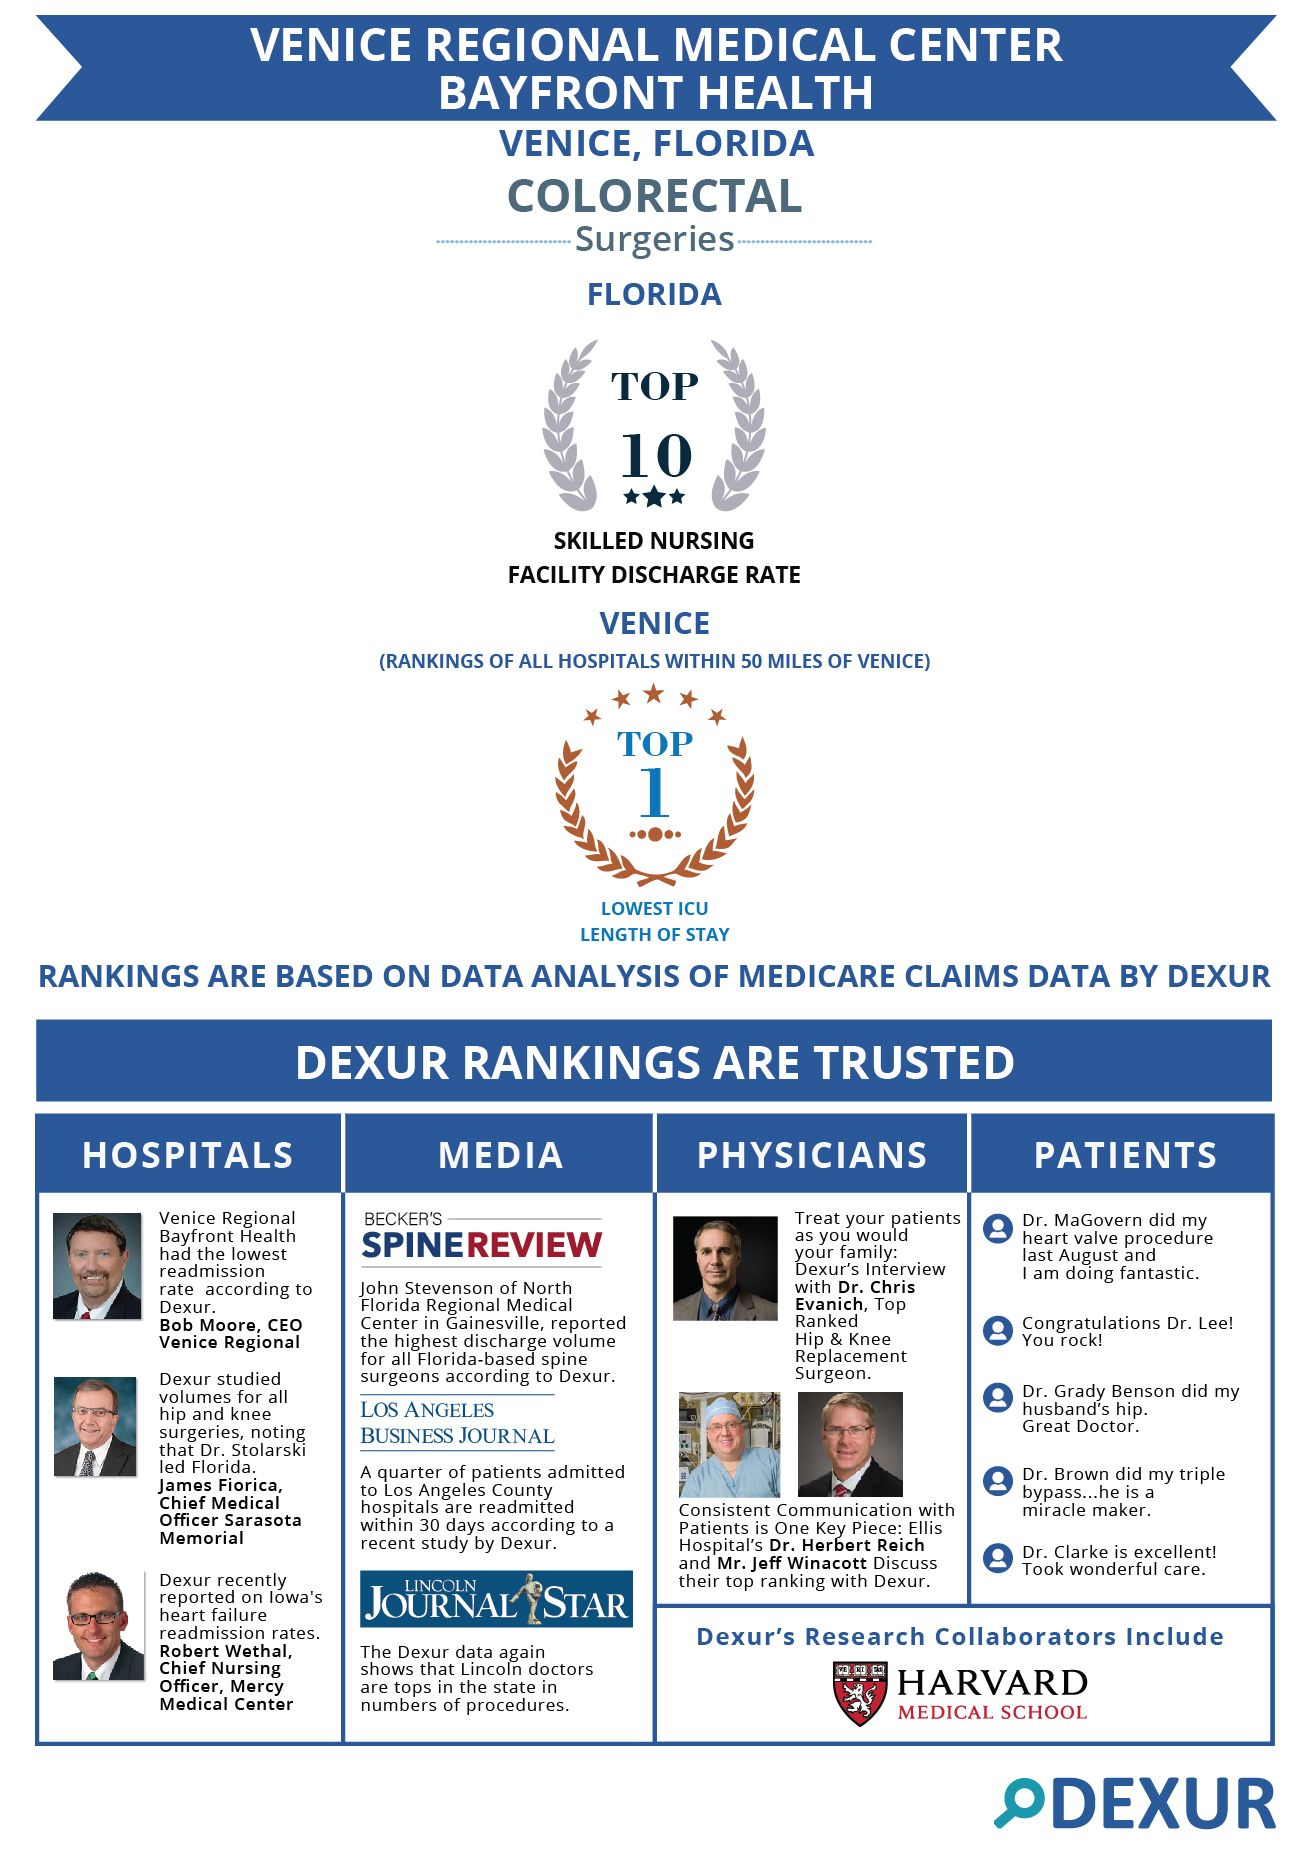 Venice Regional Medical Center Top ranked Hospital for